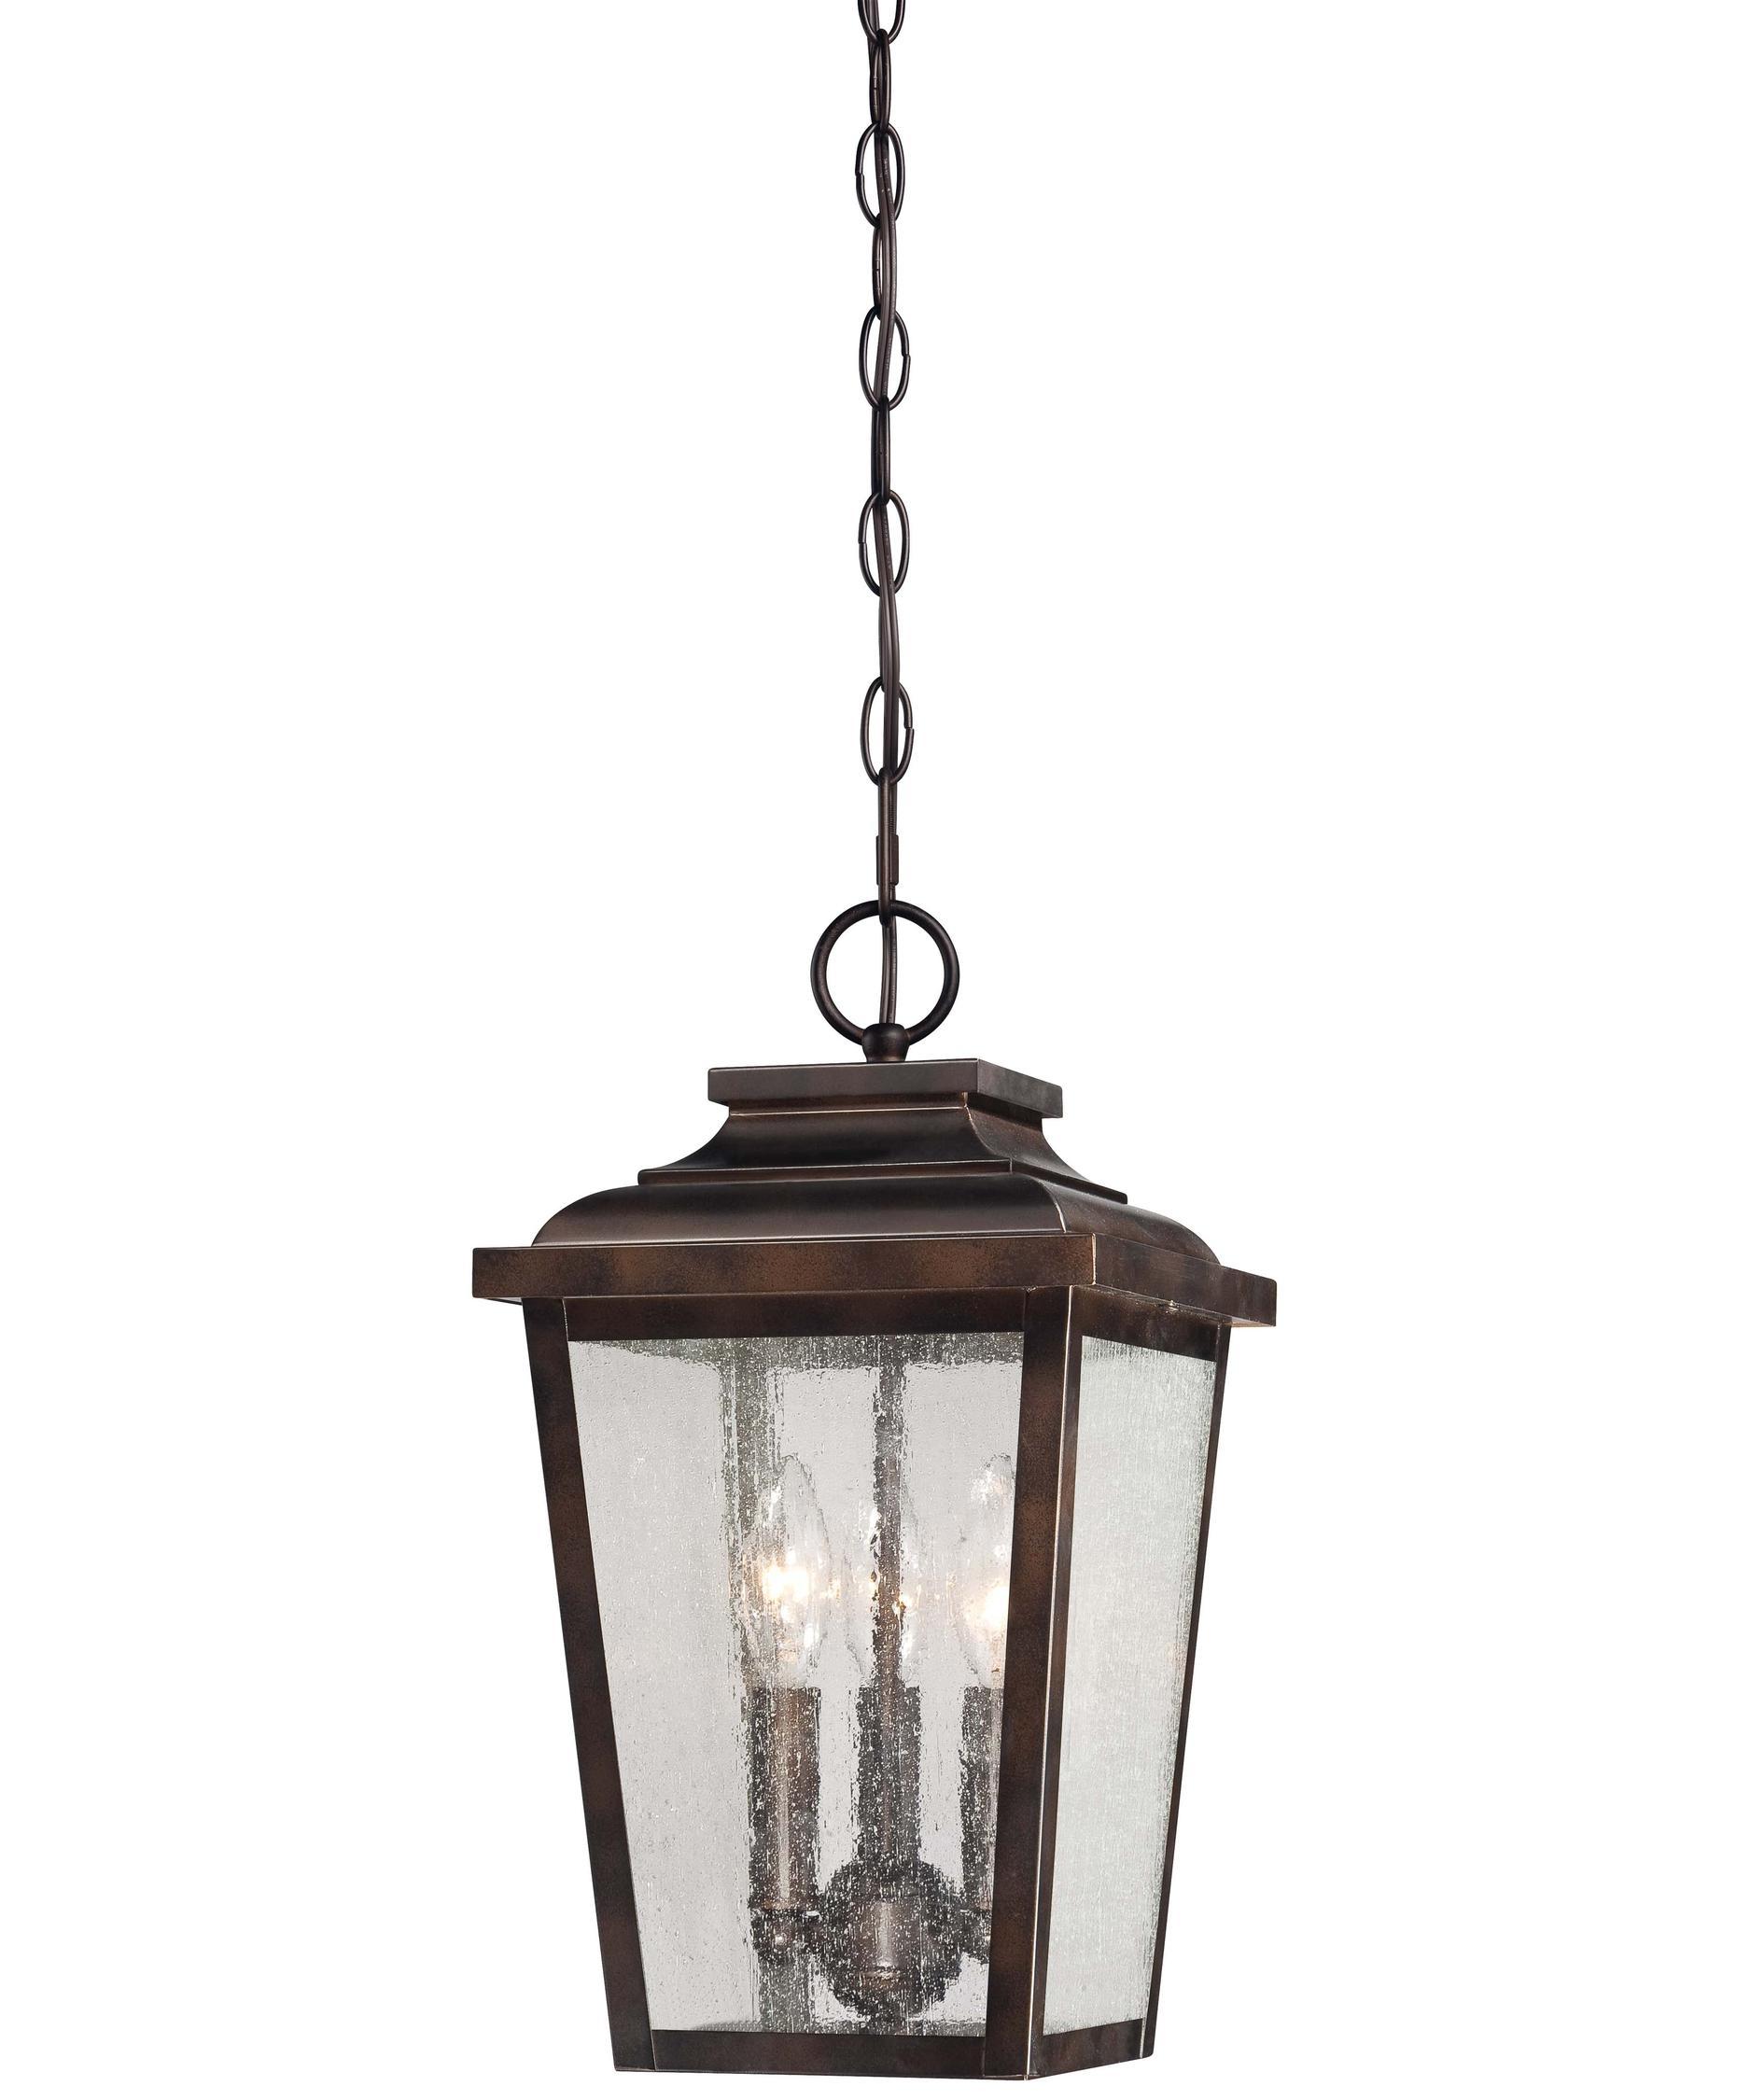 Lighting Design Ideas: Best Examples Of Outdoor Hanging Light In Decorative Outdoor Ceiling Lights (#8 of 15)